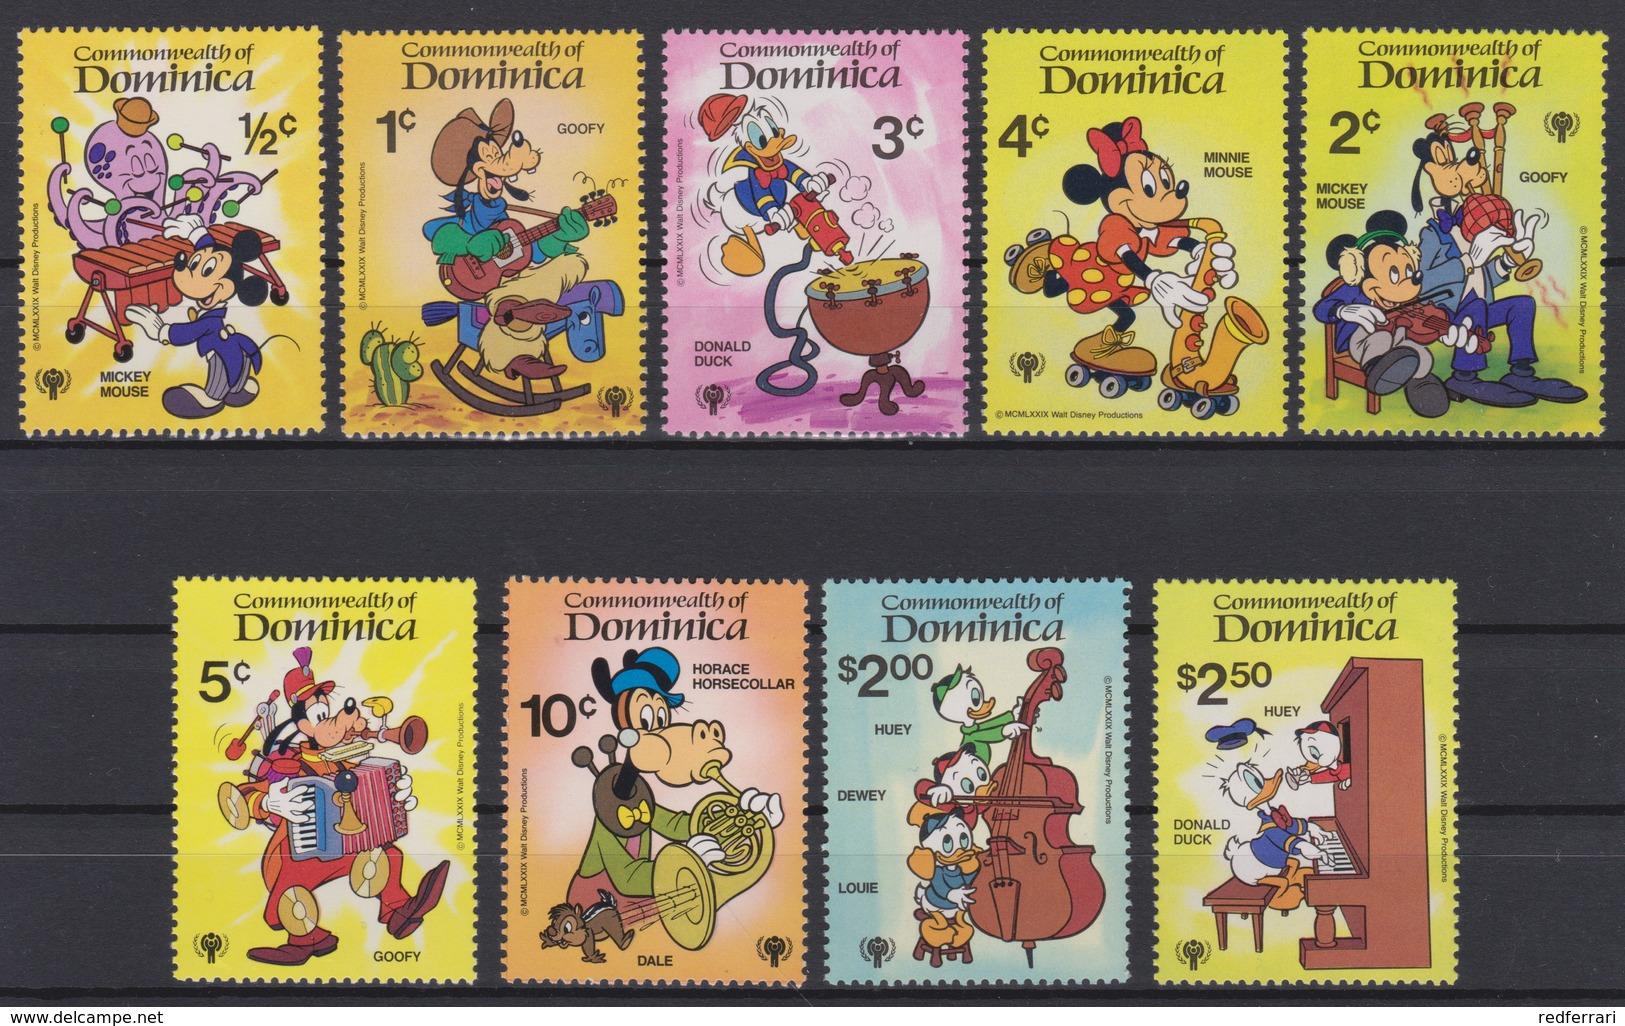 2440  Walt Disney   Commonwealth Of Dominica  1979  International Year Of The Child  ( Personages De Walt Disney ) . - Disney